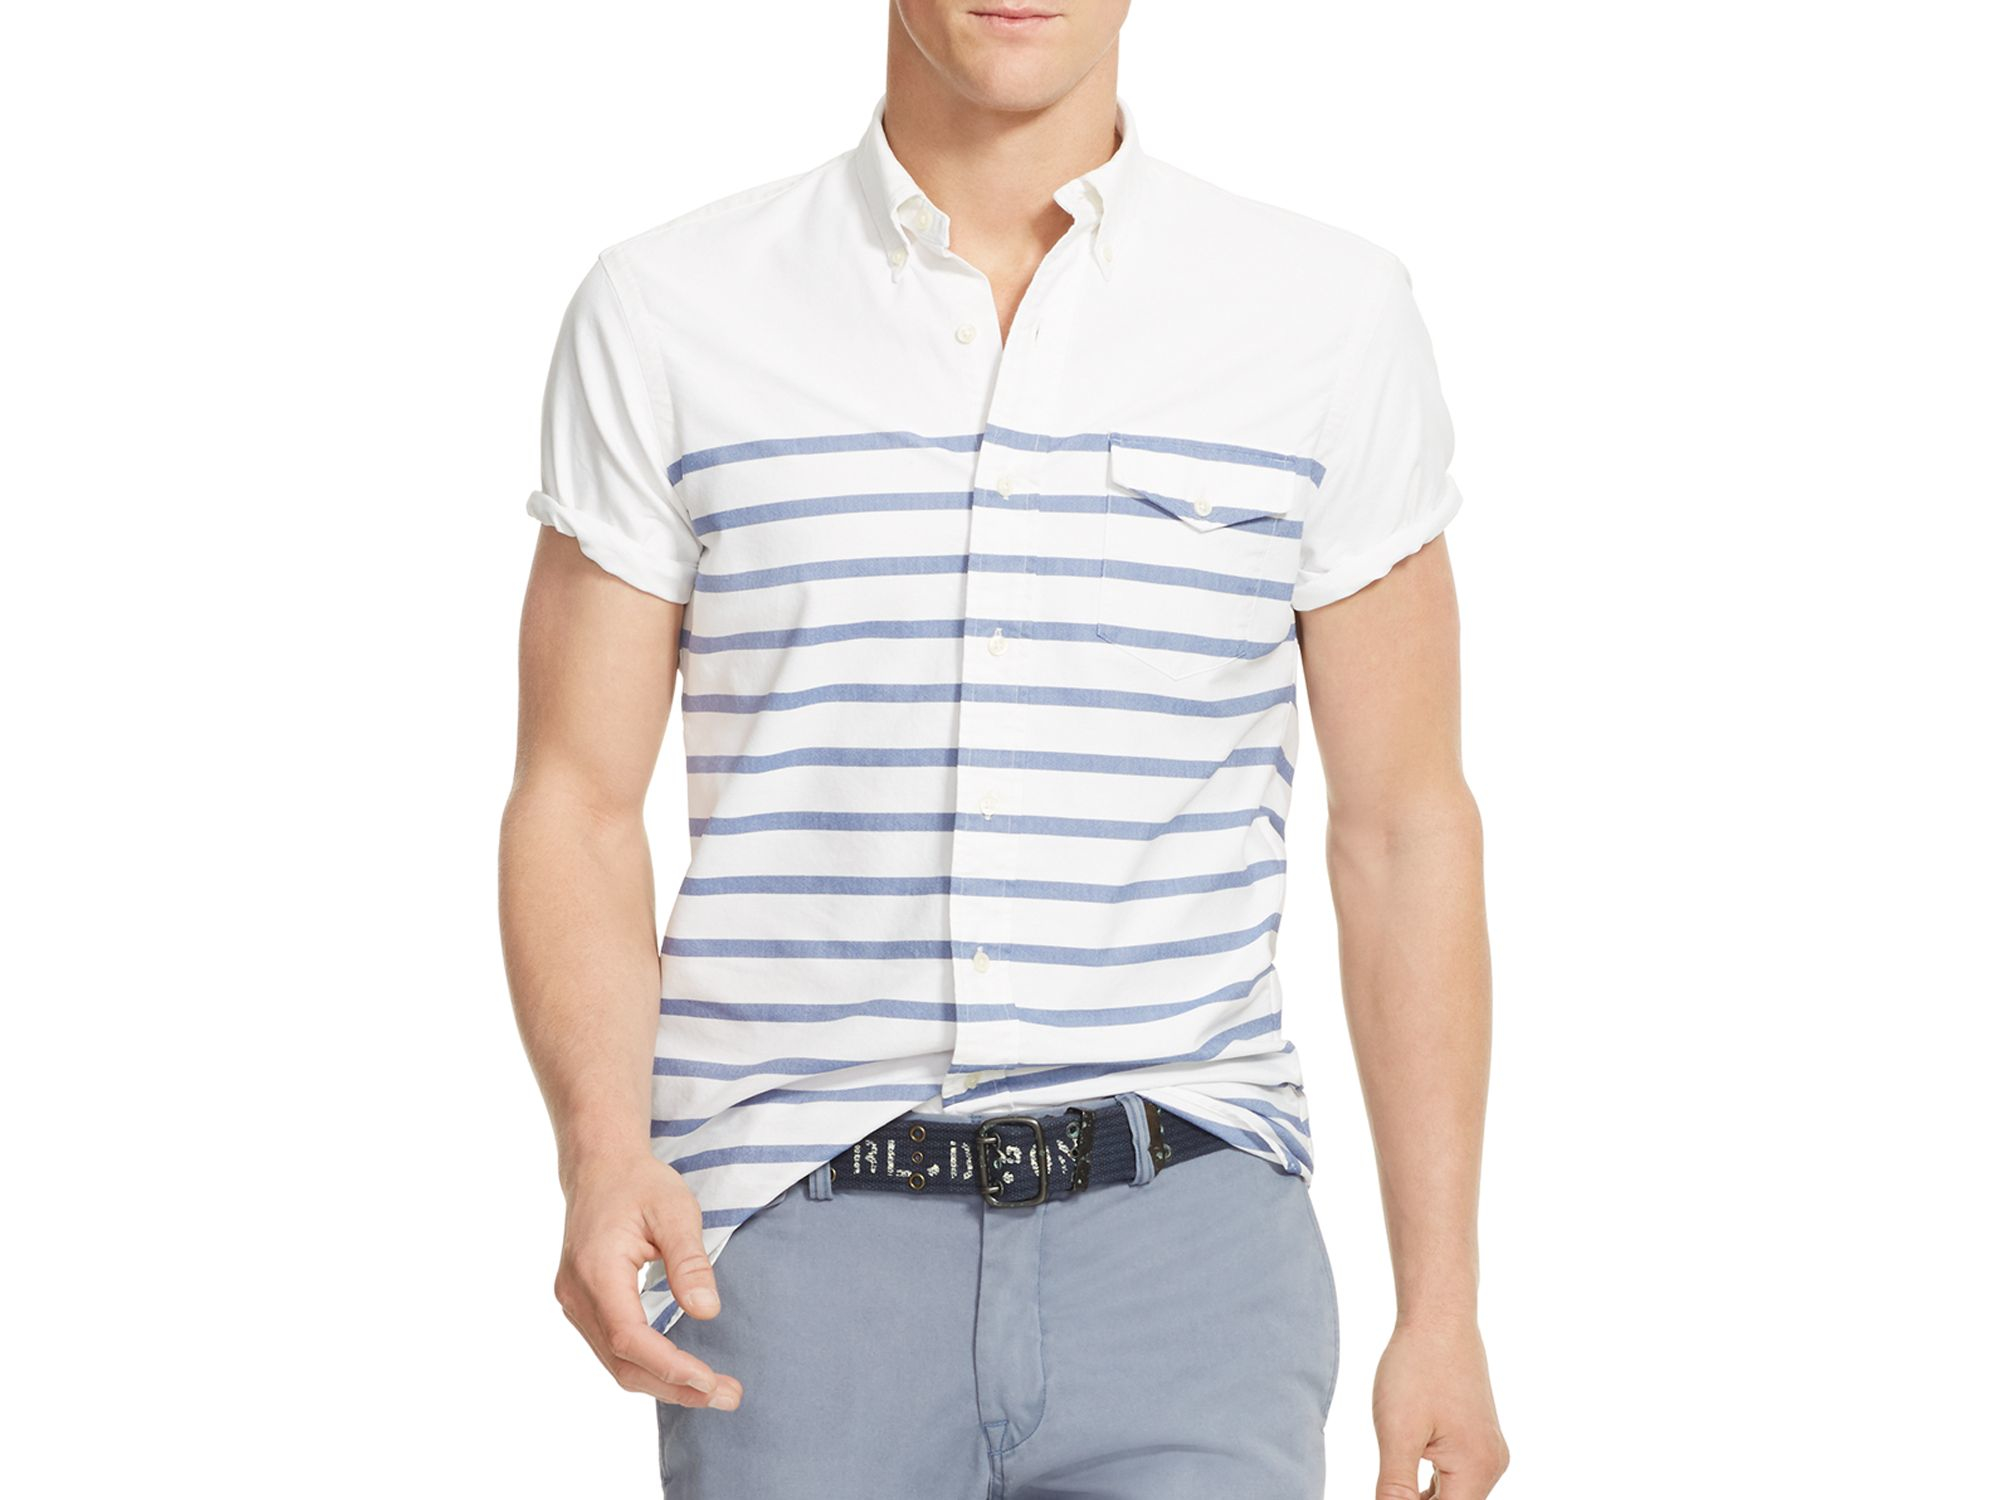 Polo ralph lauren striped oxford regular fit button down for Striped button down shirts for men